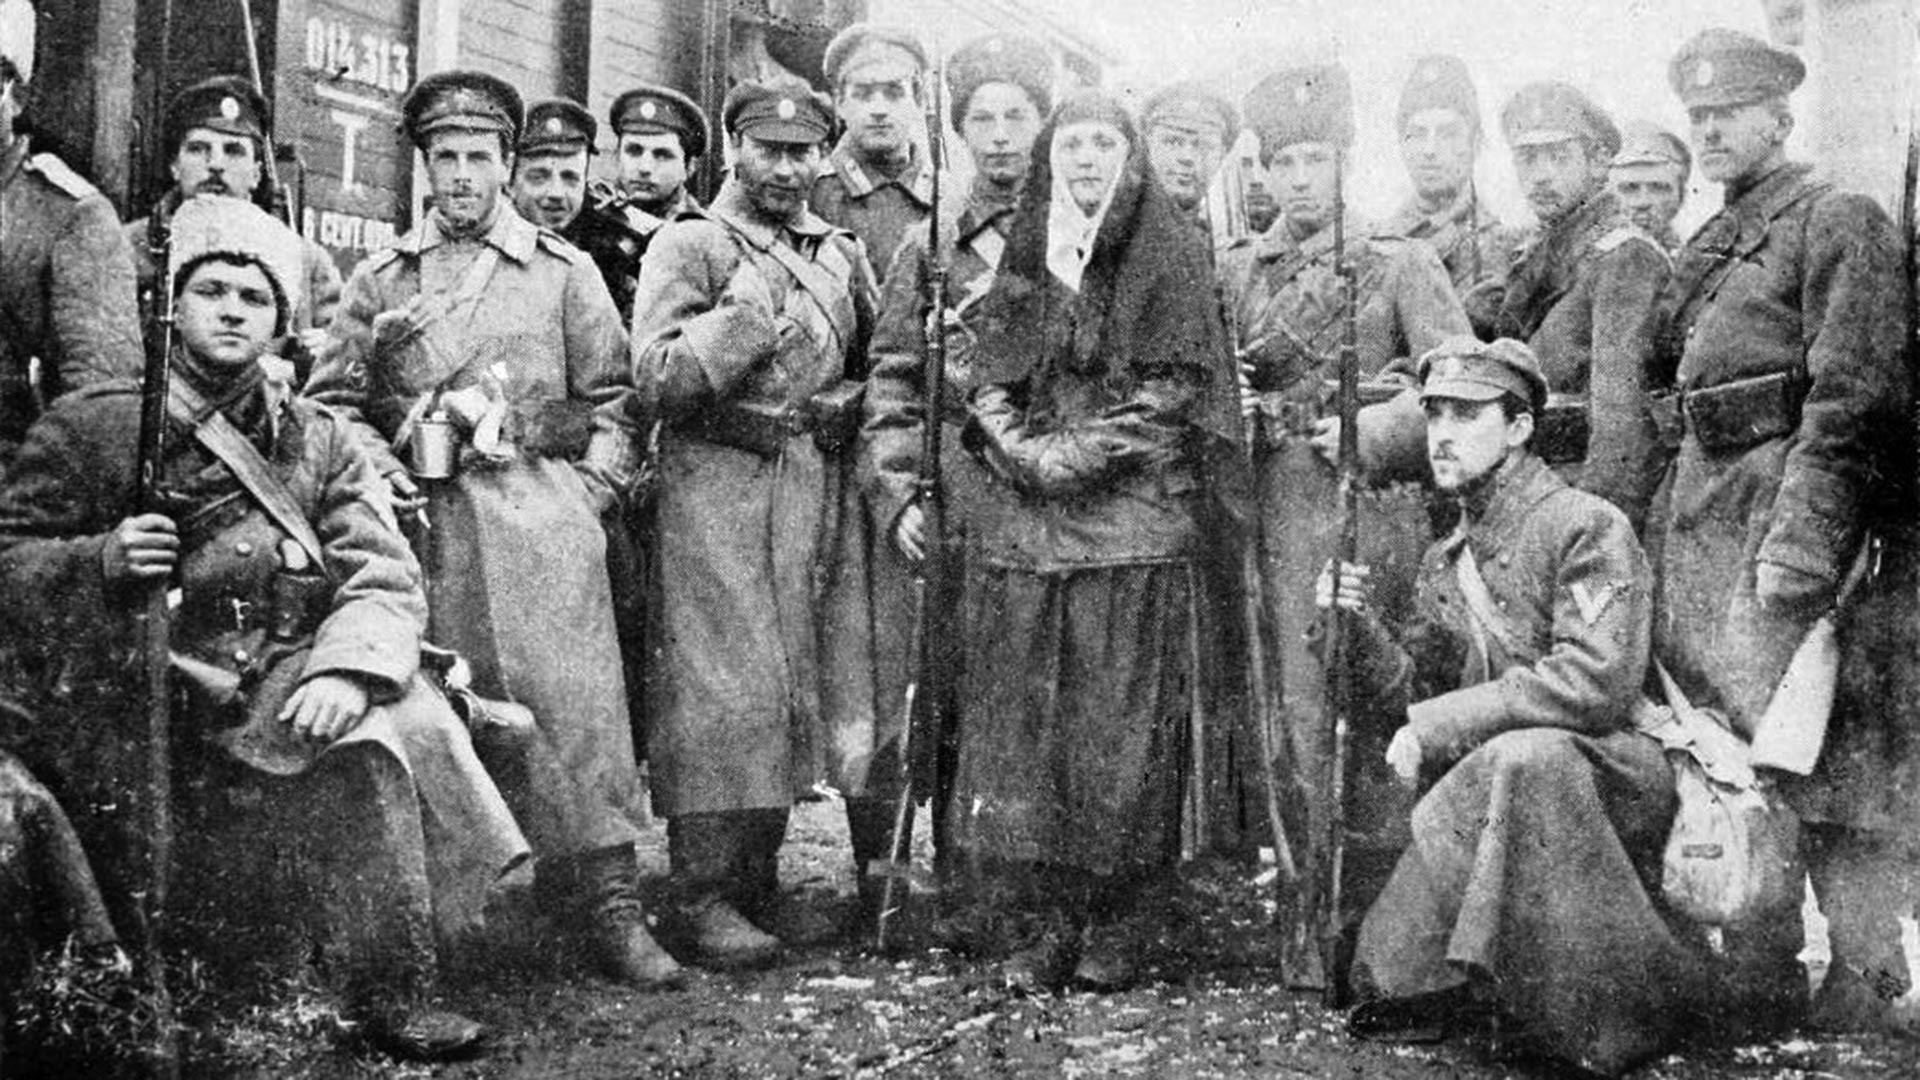 Soldados do Exército Branco